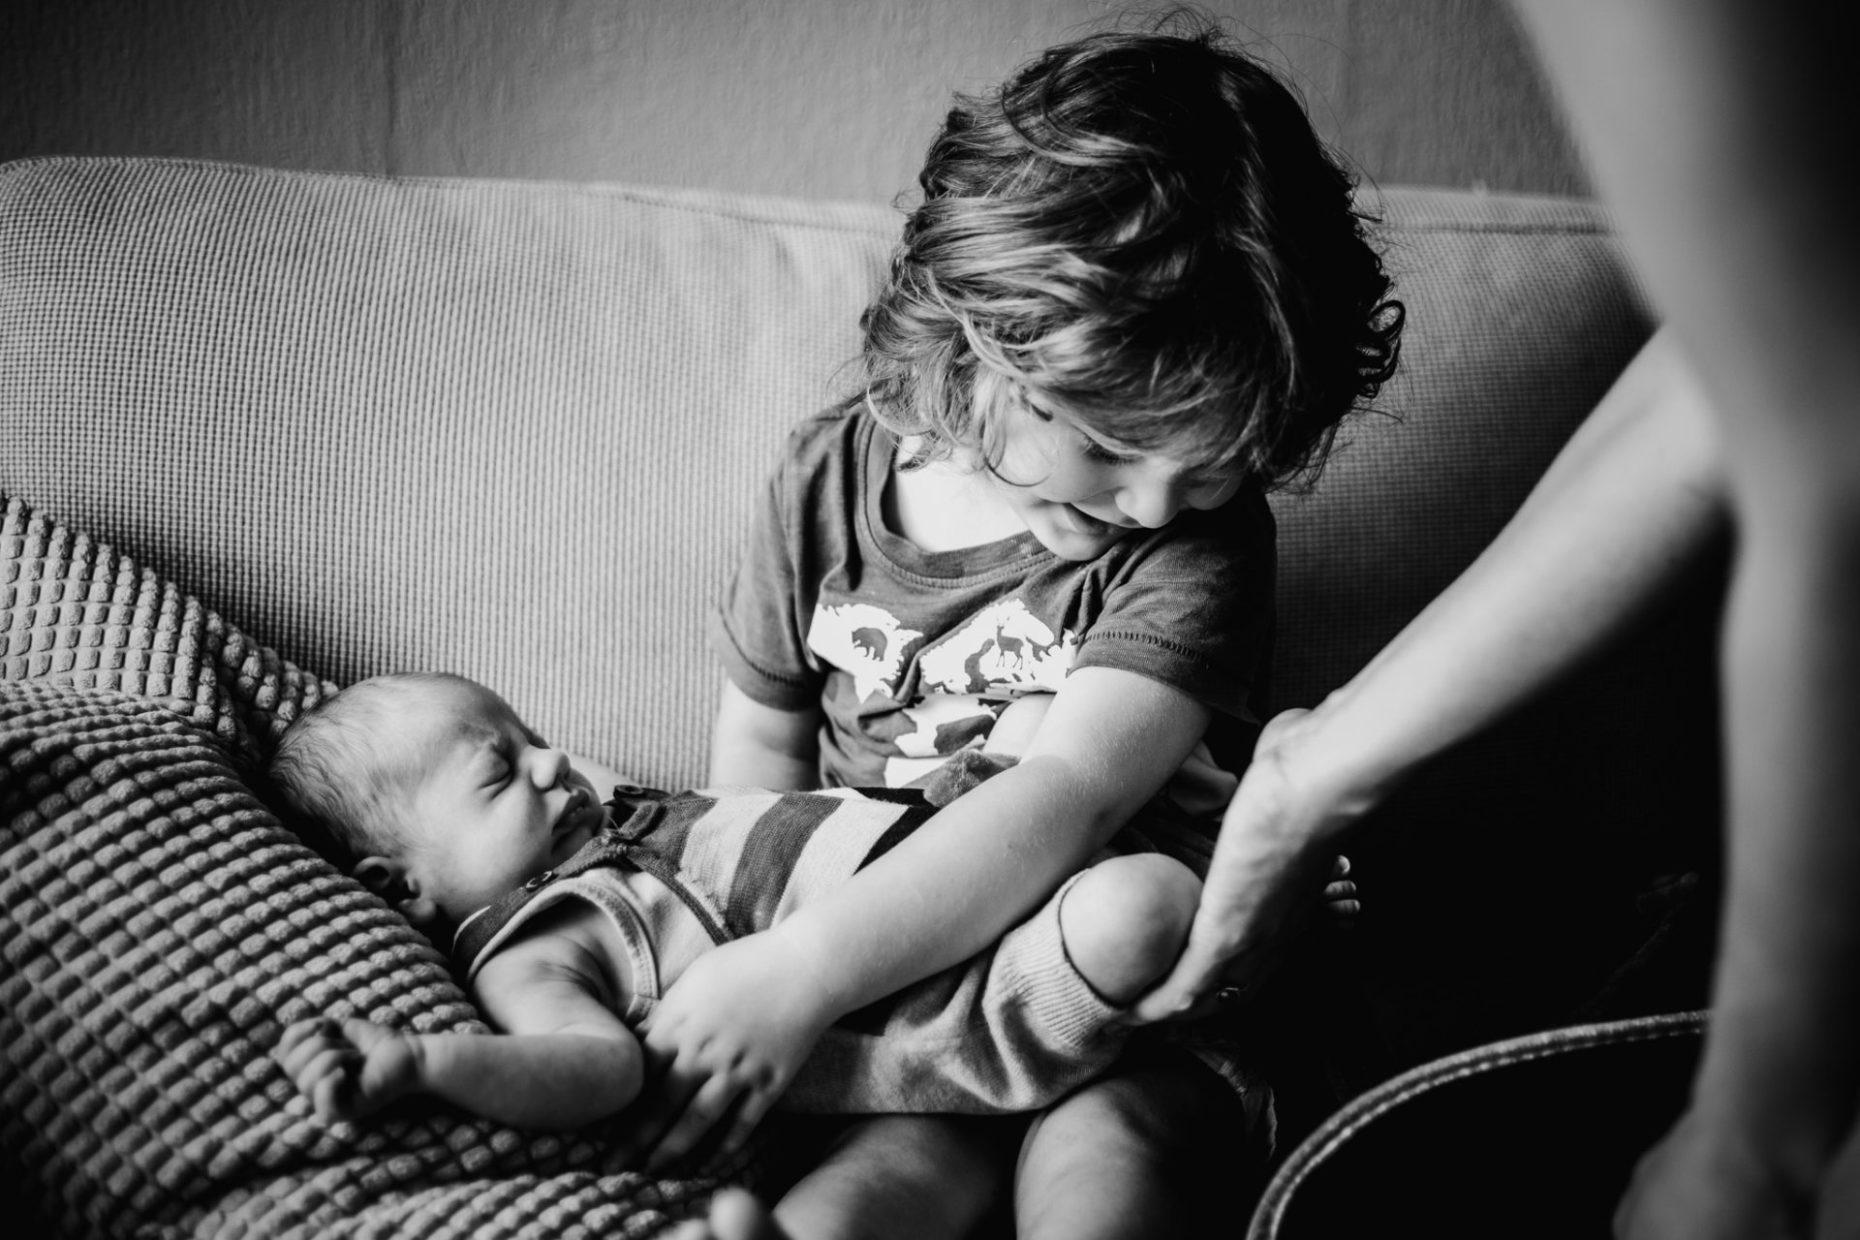 EN: Little boy (aprox 2 years old) holding his newborn brother for the first time. They're sitting on a couch. Moms hand is there helping him. Black and white photography. NL: Klein kind dat voor het eerst zijn pasgeboren broertje vasthoudt. Mama helpt hem daarbij. Baby fotografie.